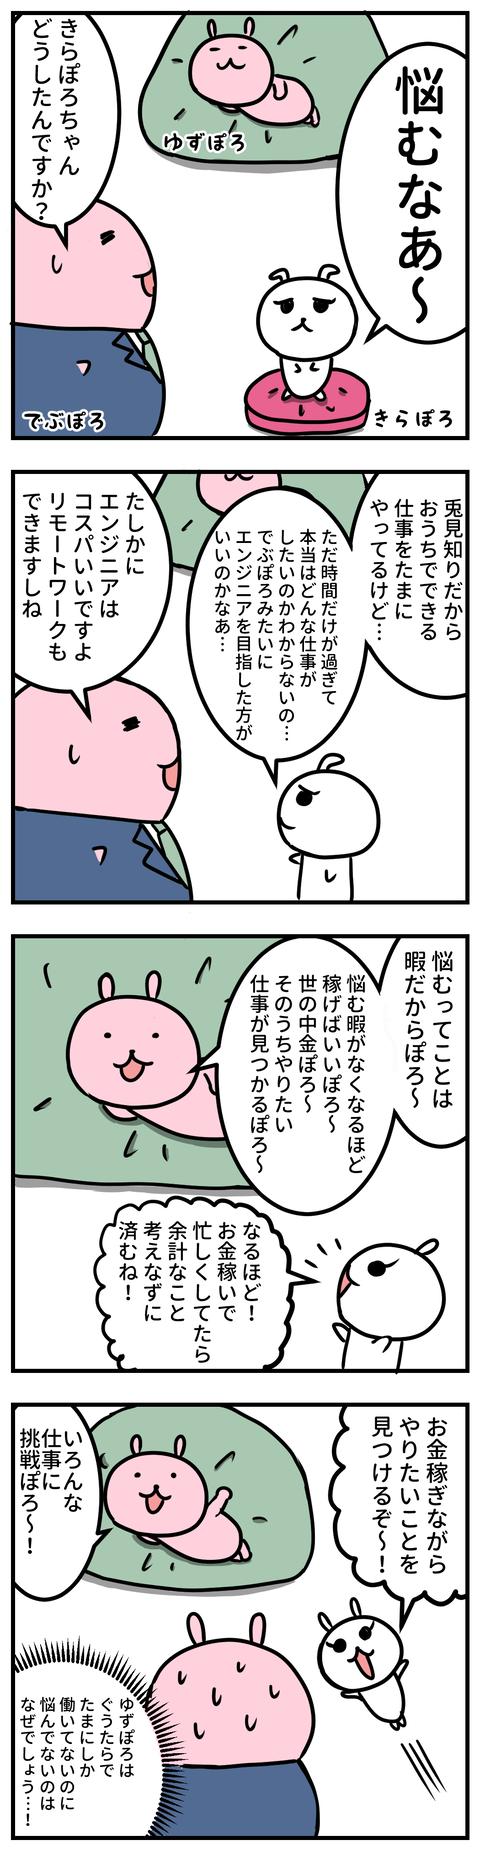 manga-yuzuporo40-1